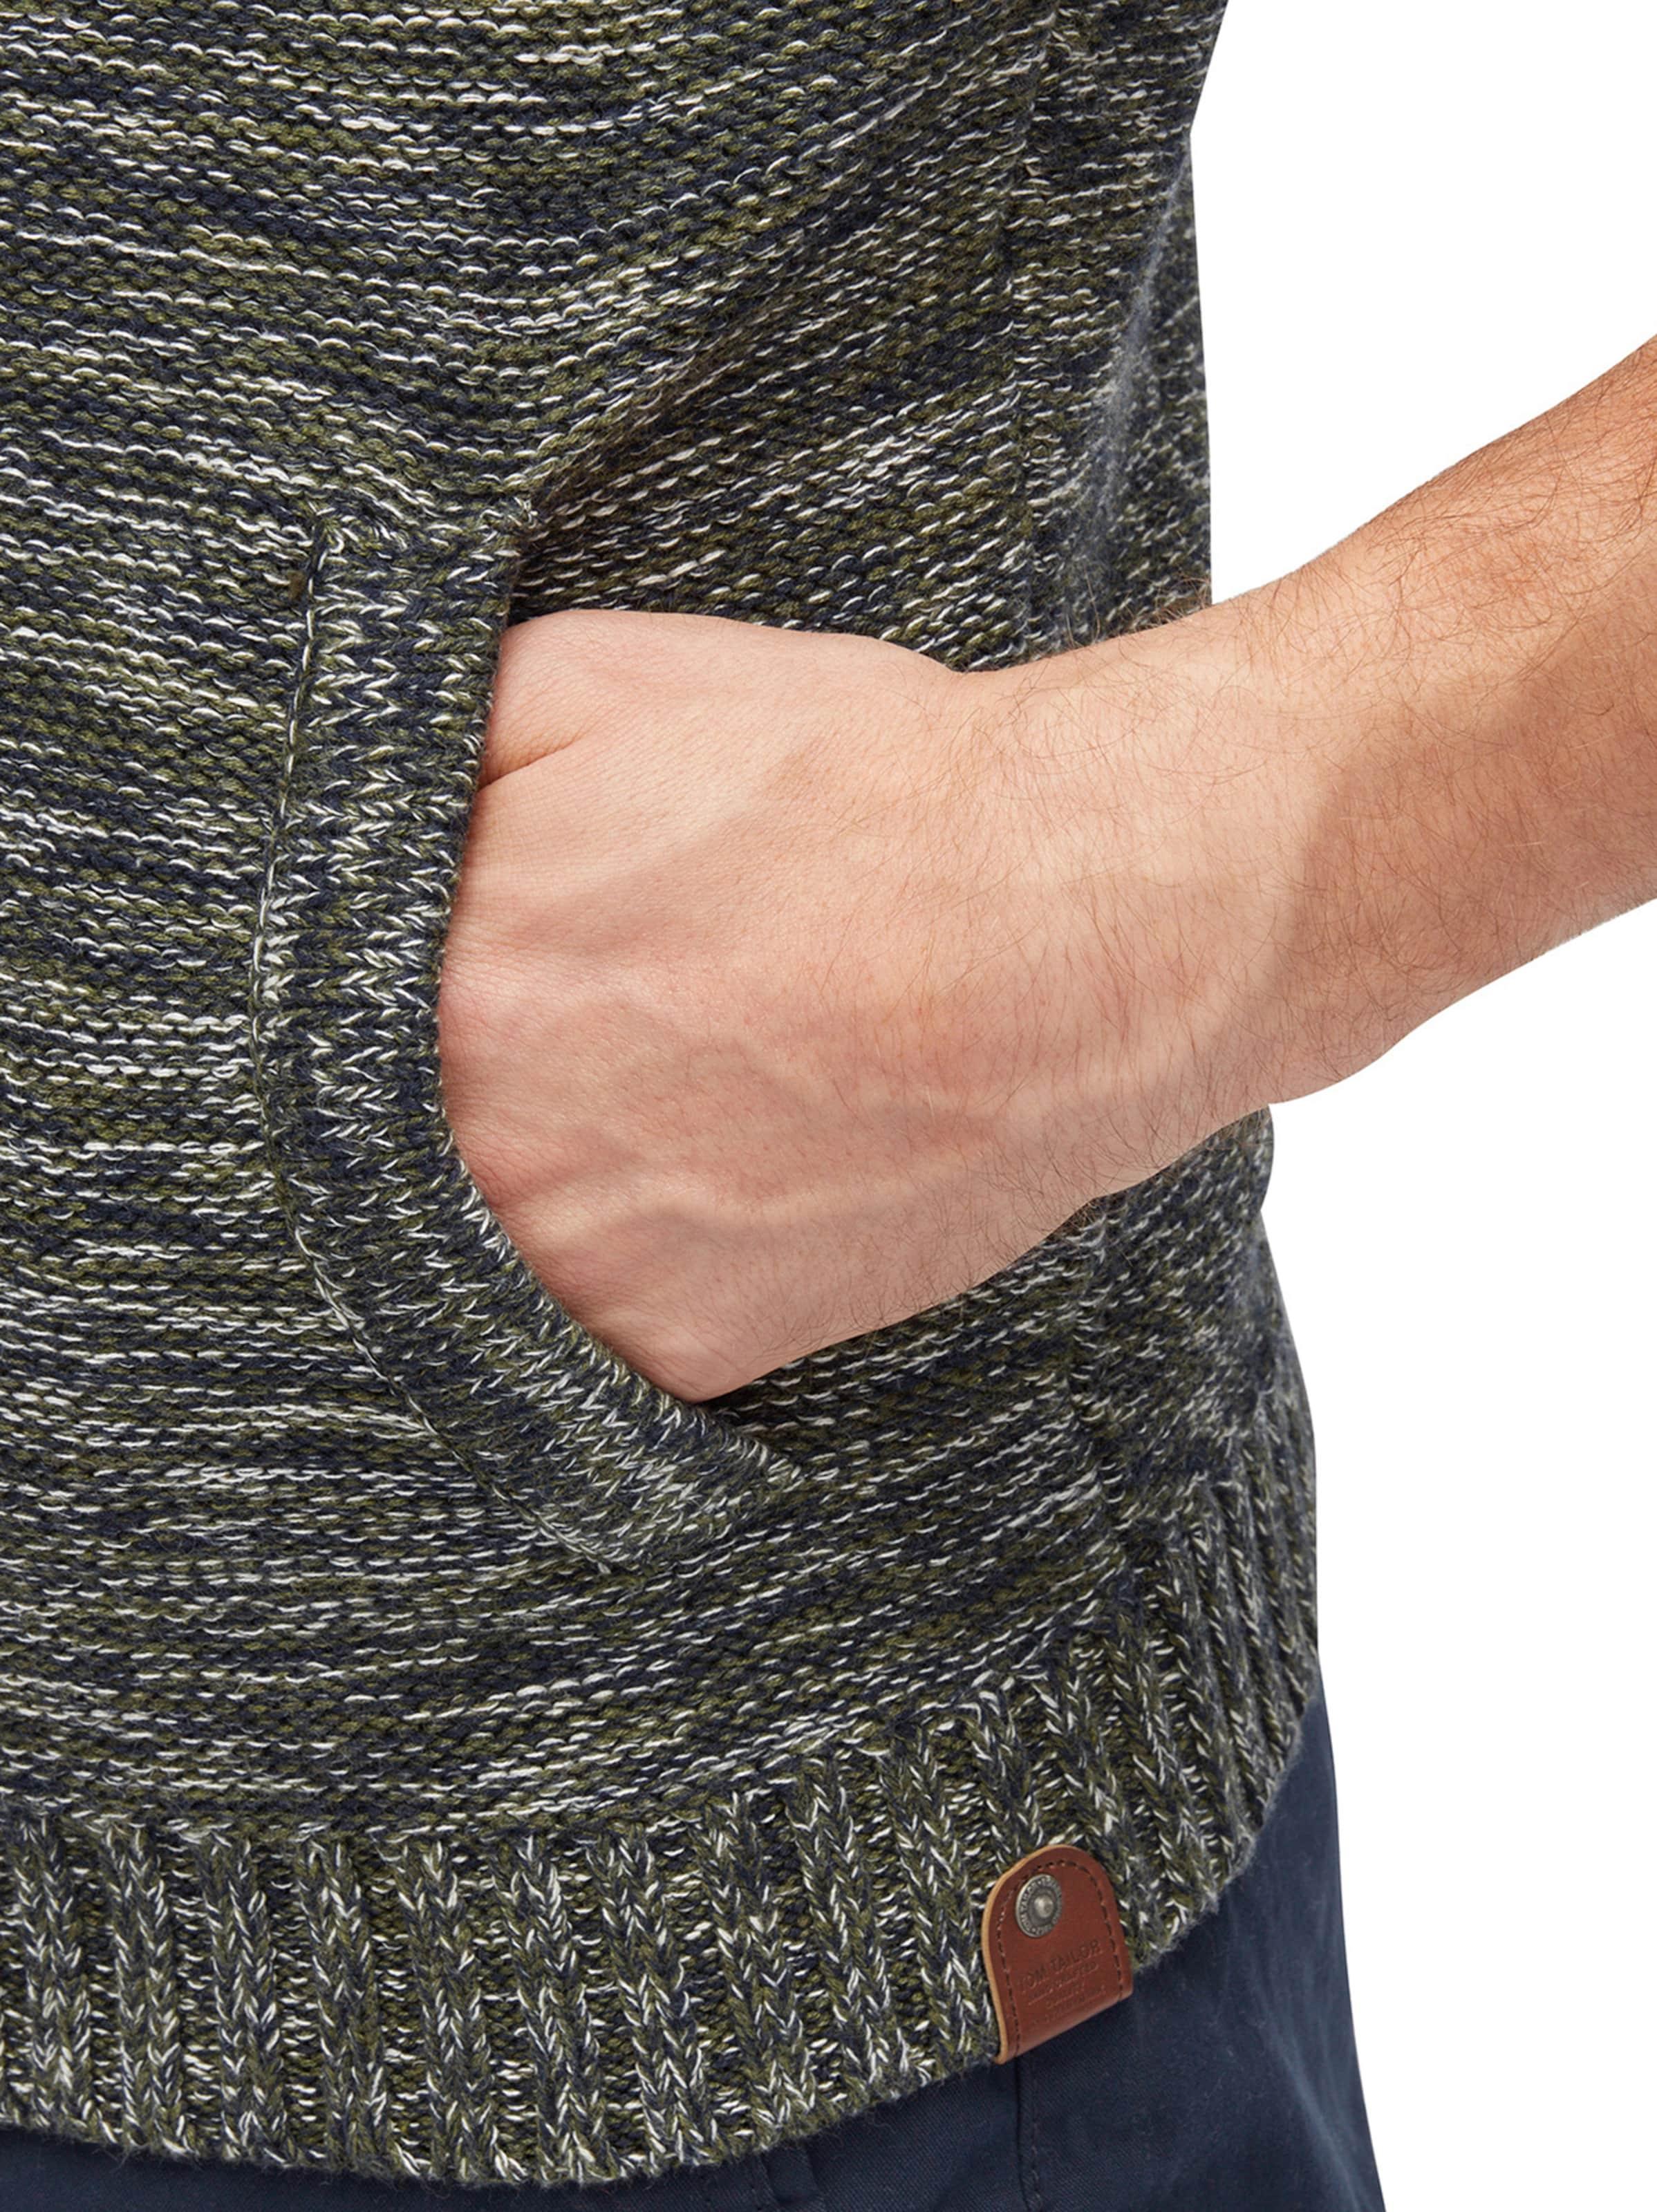 Auslass Manchester Großer Verkauf TOM TAILOR knit Strickjacke in Melange-Optik Manchester Großer Verkauf Günstig Online rcqCV0Er